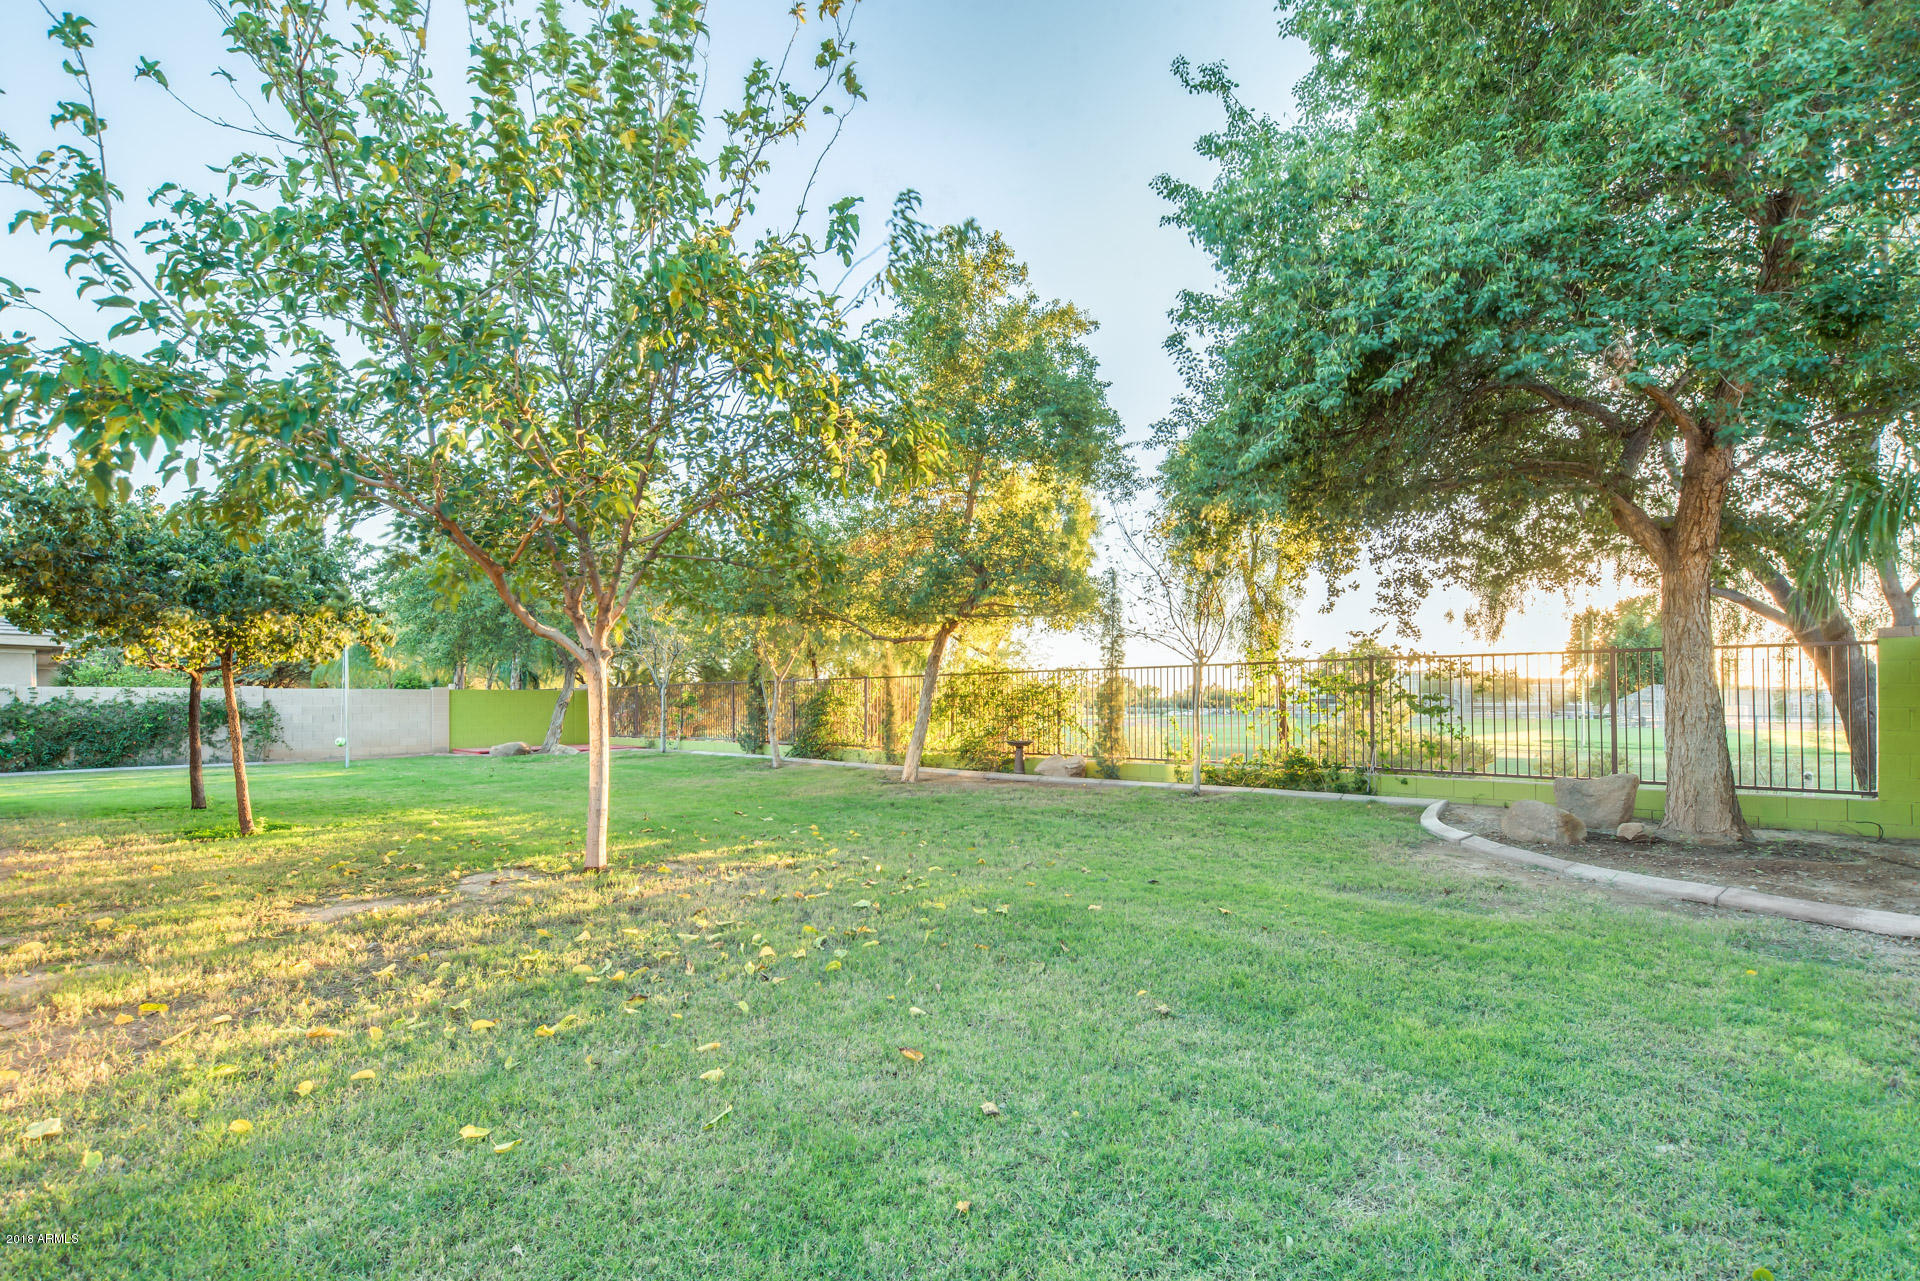 MLS 5839131 4286 S STAR CANYON Drive, Gilbert, AZ 85297 Gilbert AZ Three Bedroom